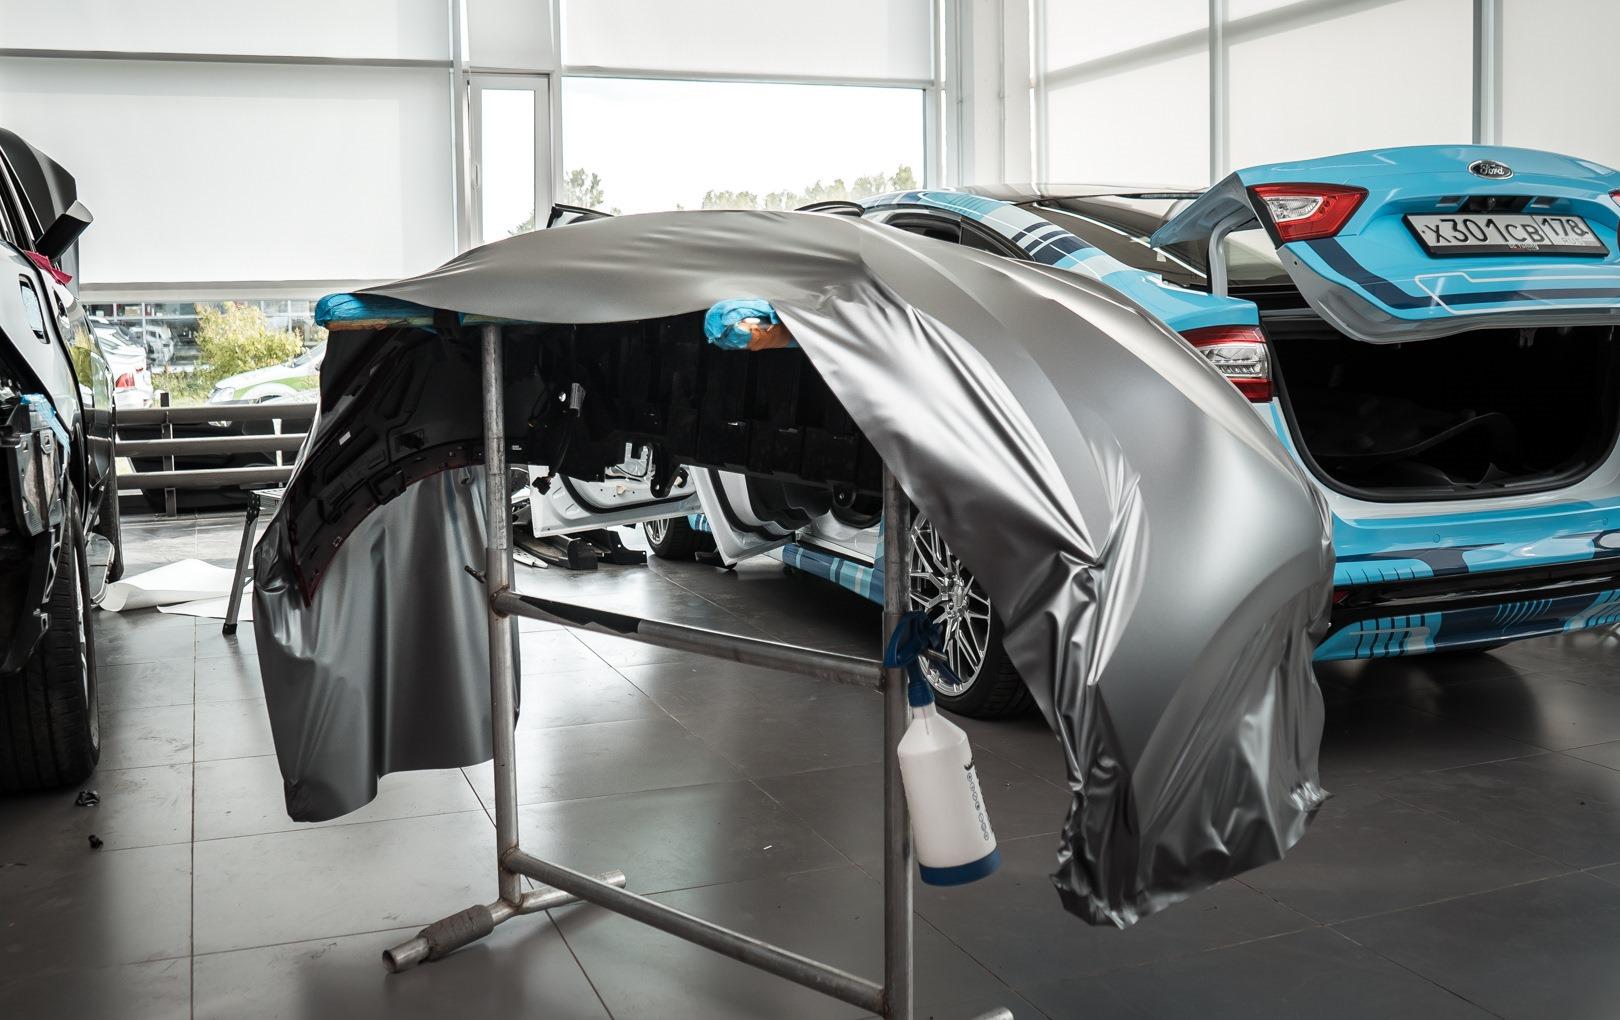 Пленка на бампере автомобиля Renault Arkana